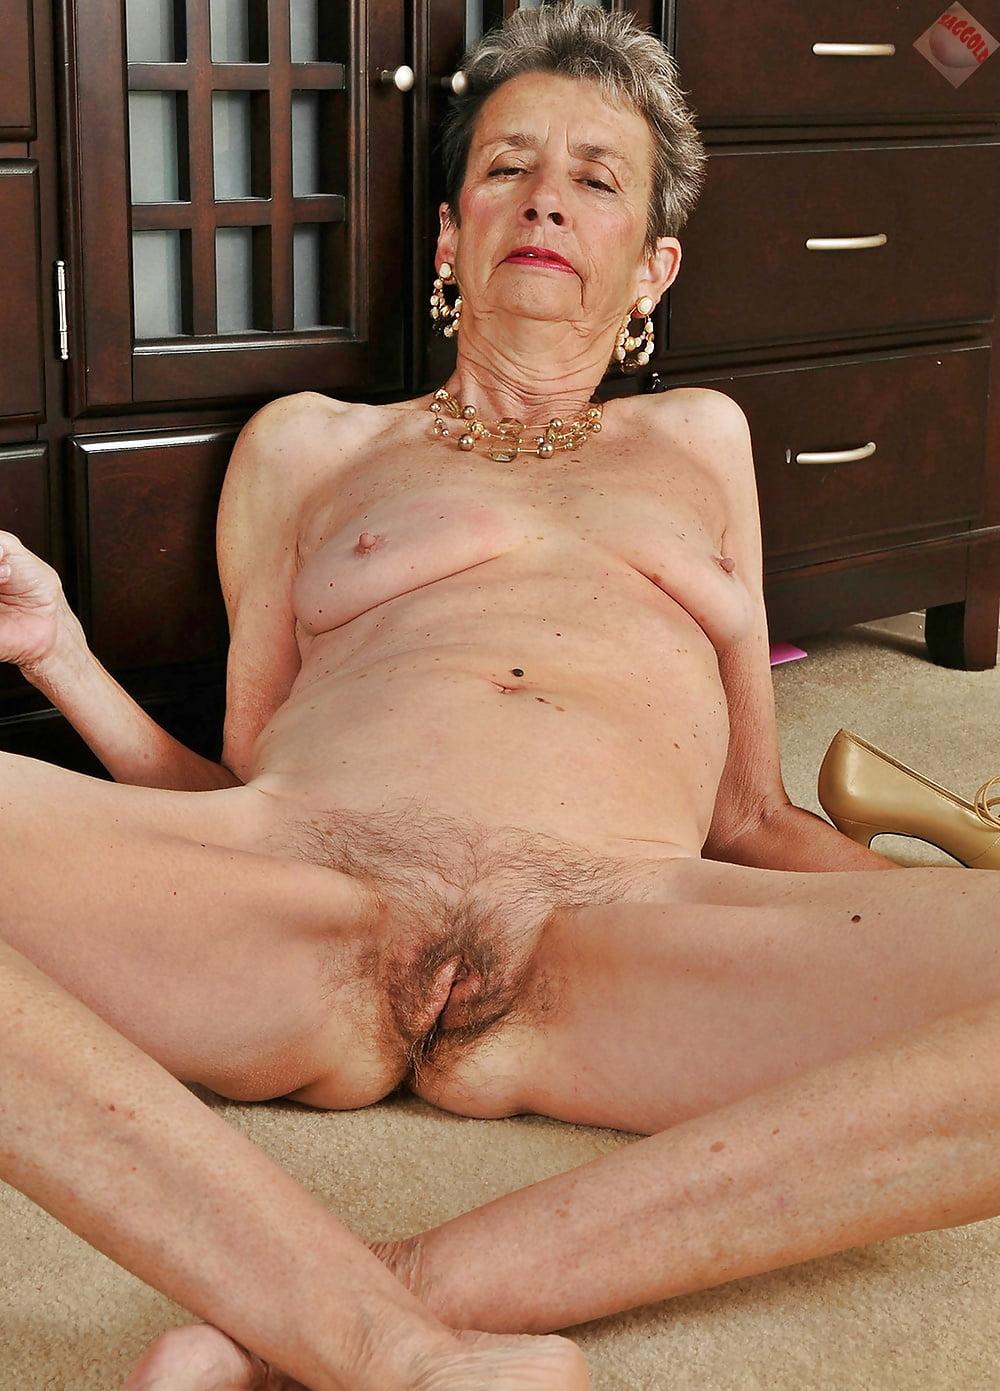 I Love Granny Pussy - 18 Pics  Xhamster-3112